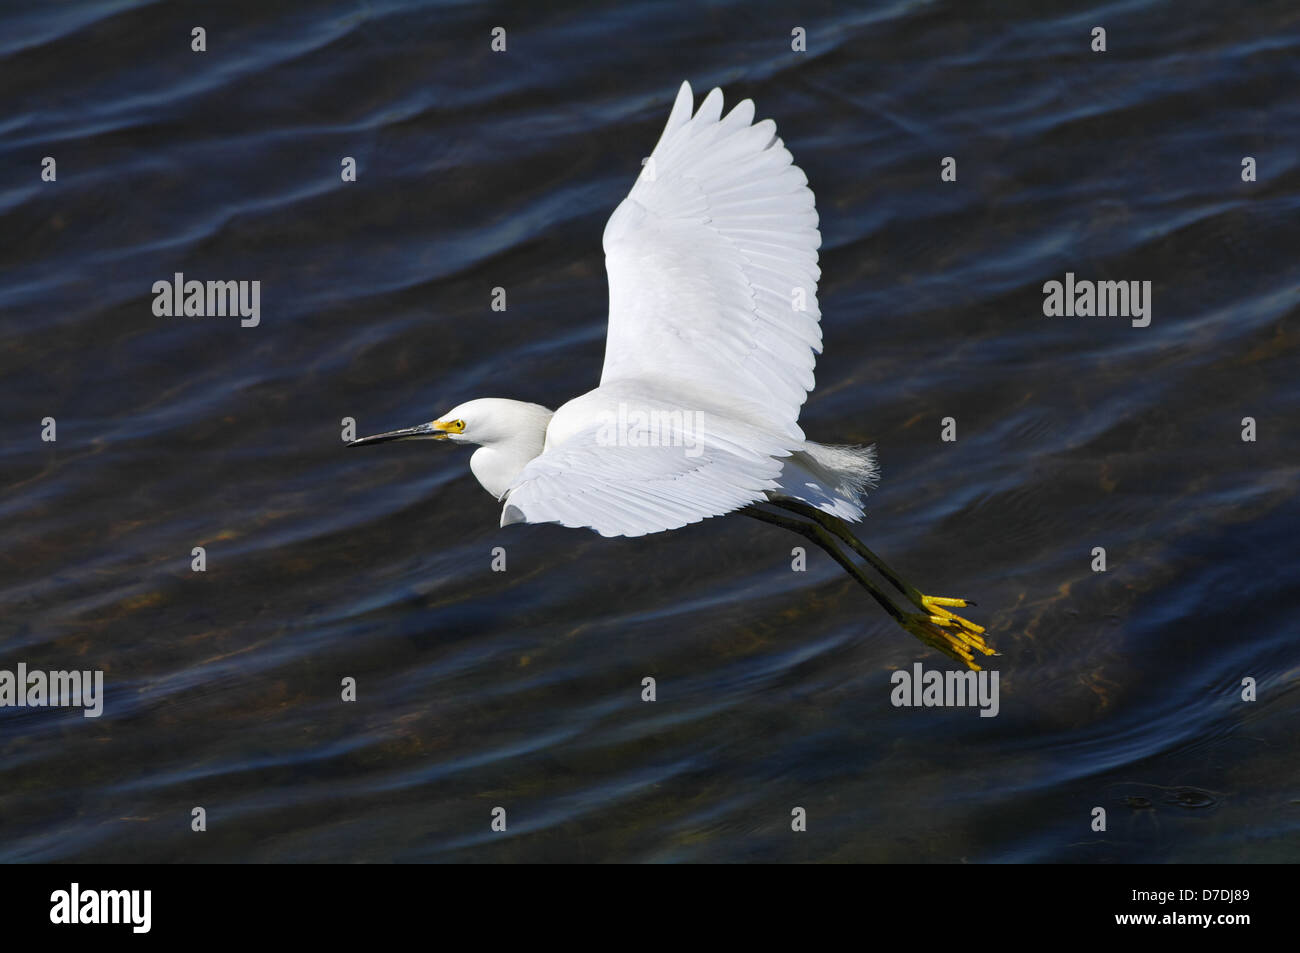 Egret, bird of the heron family, in flight. - Stock Image